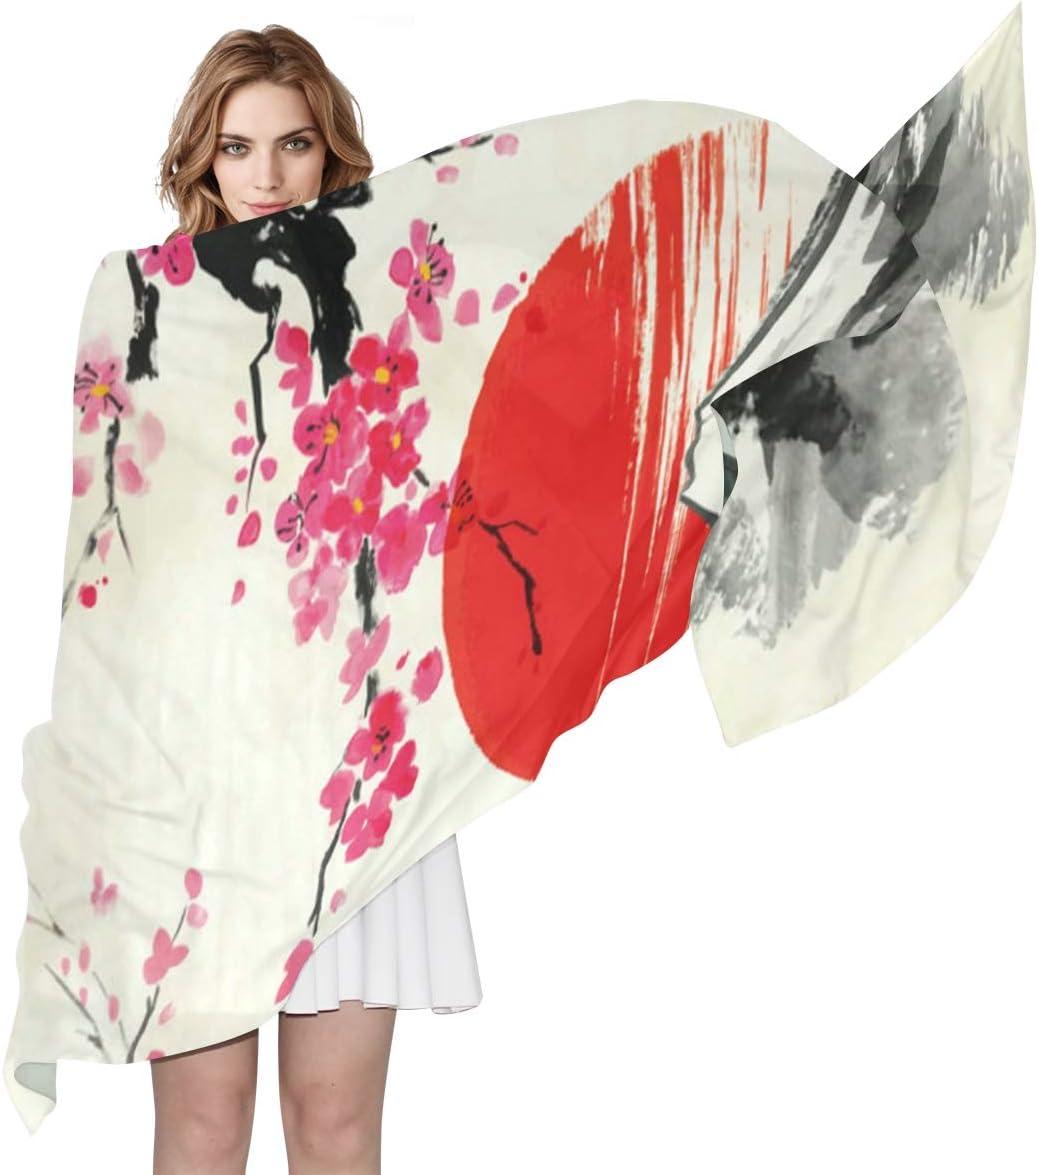 AUUXVA Fashion Scarf Watercolor Floral Cherry Blossom Sunset Japanese Long Lightweight Sunscreen Scarf Shawl Wrap Muffler Neckerchief for Women Men